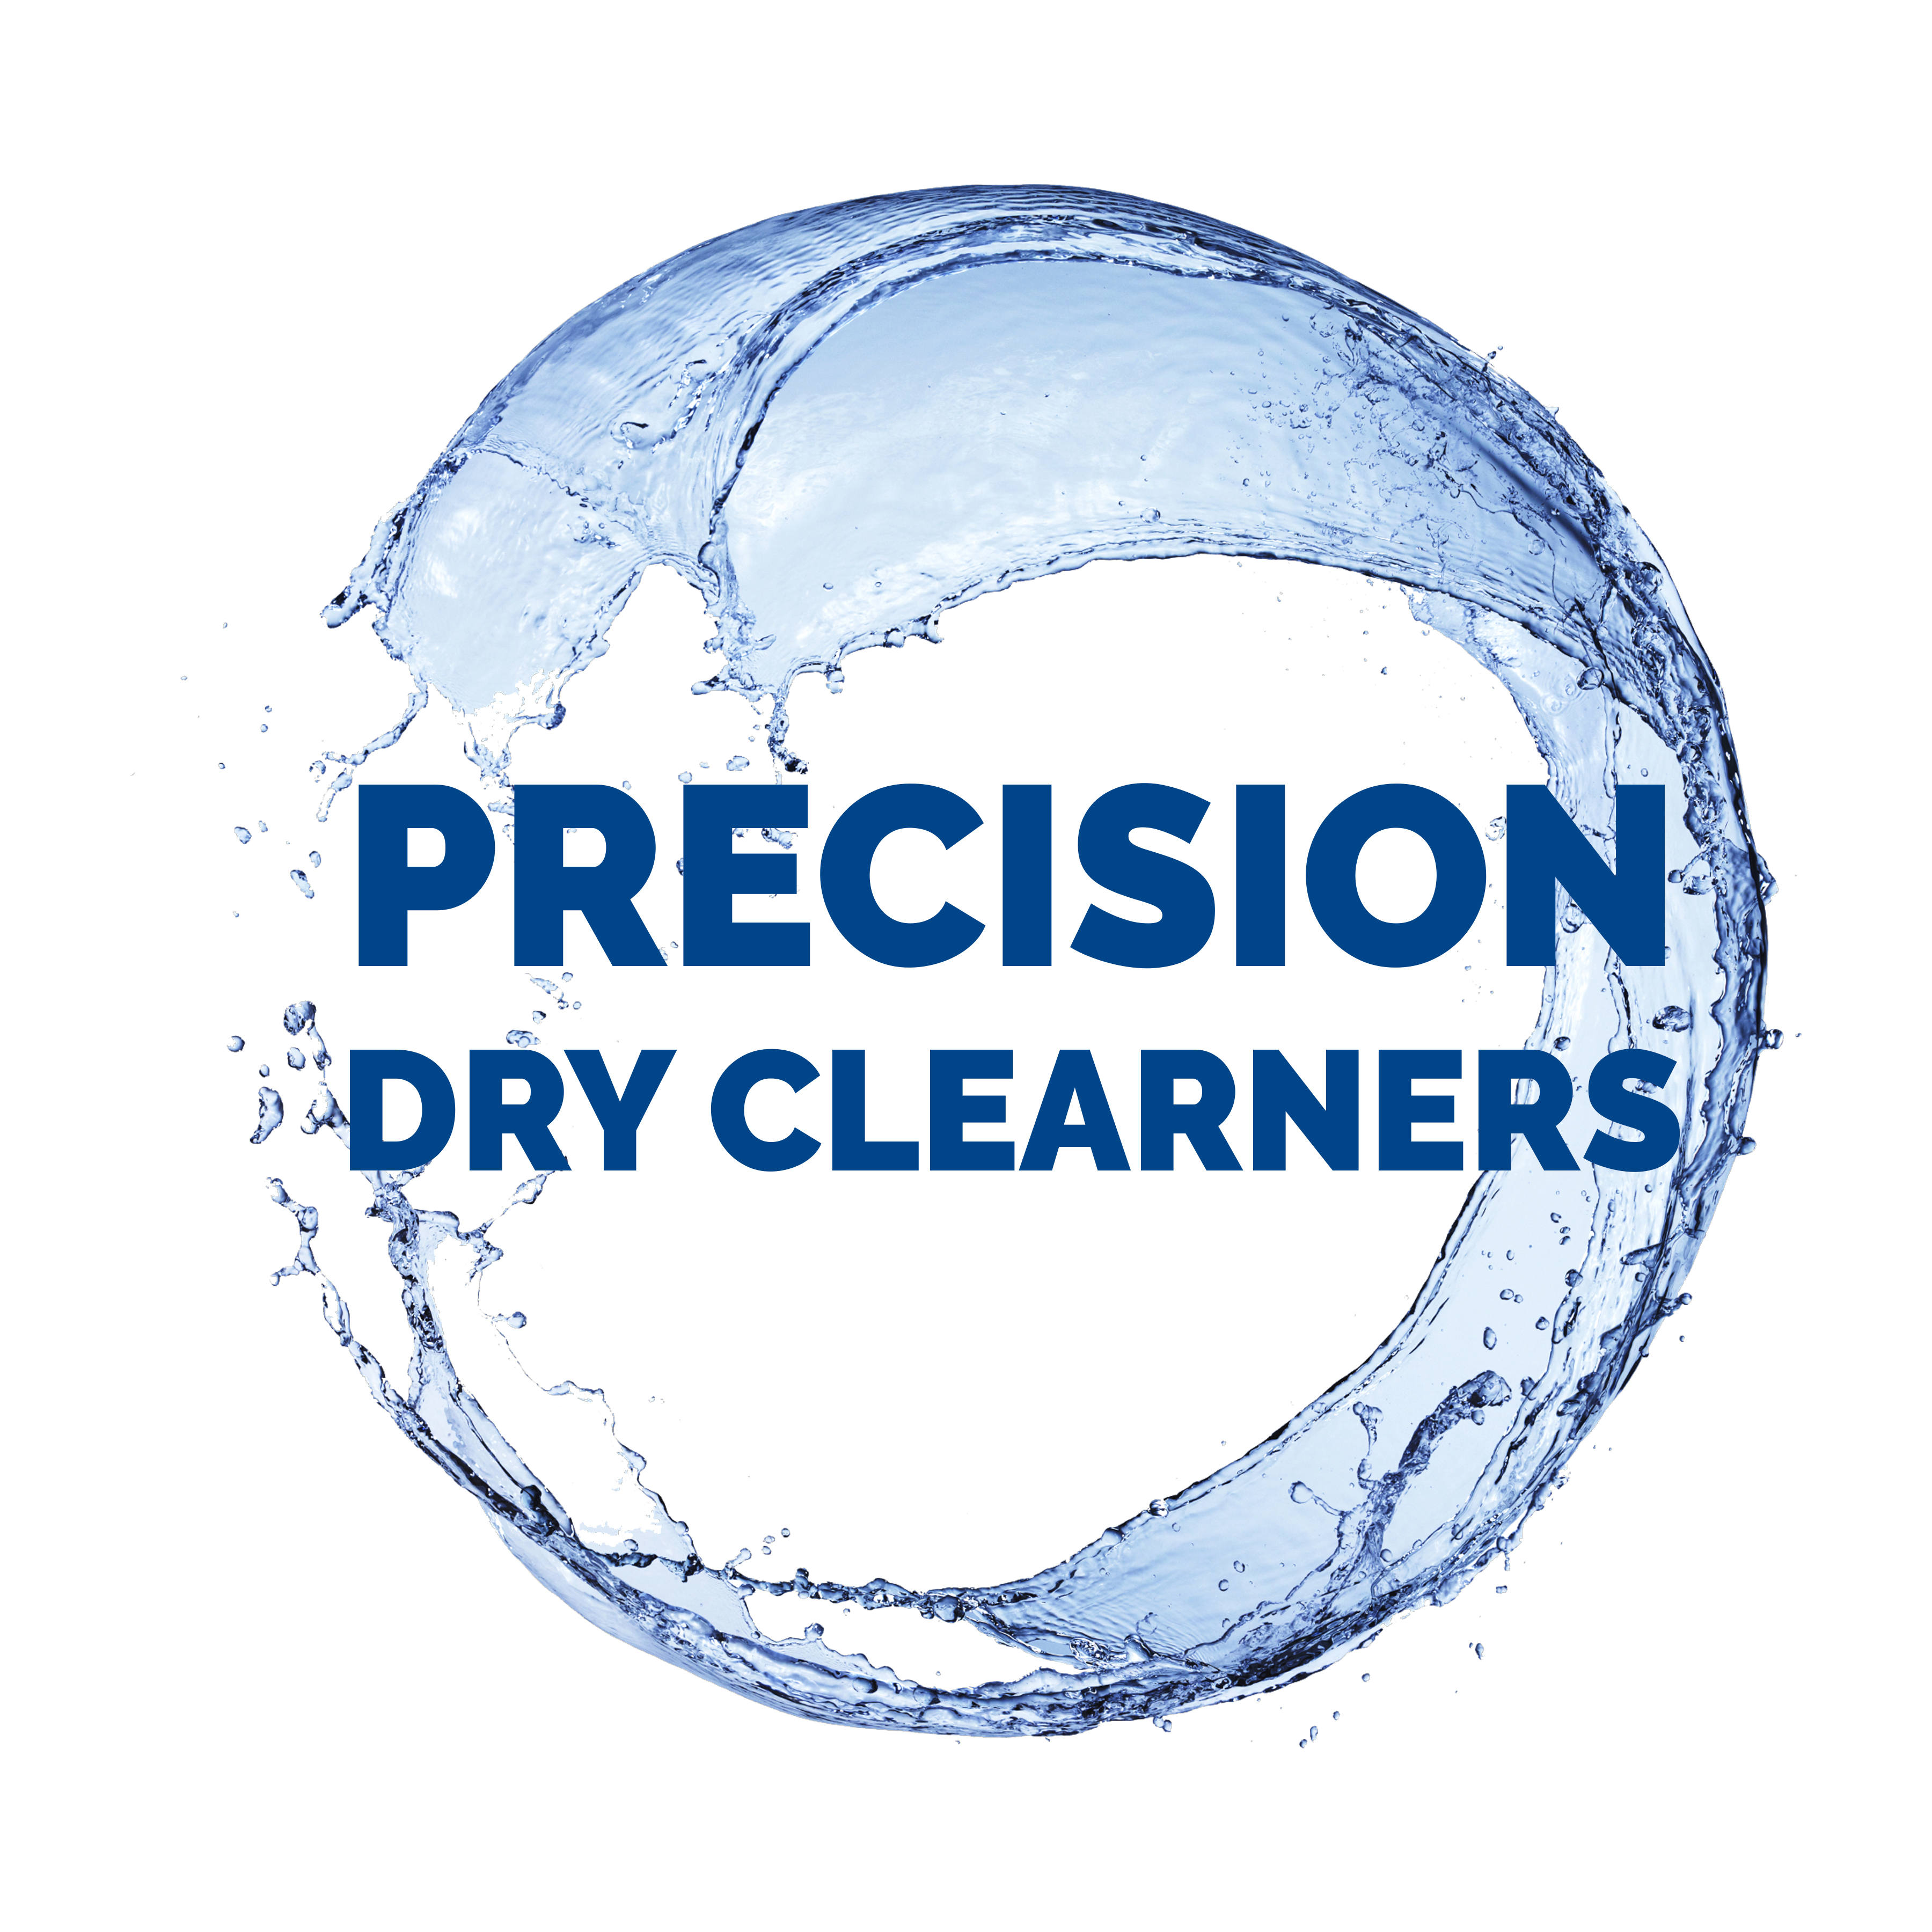 Precision Dry Cleaners Bexleyheath